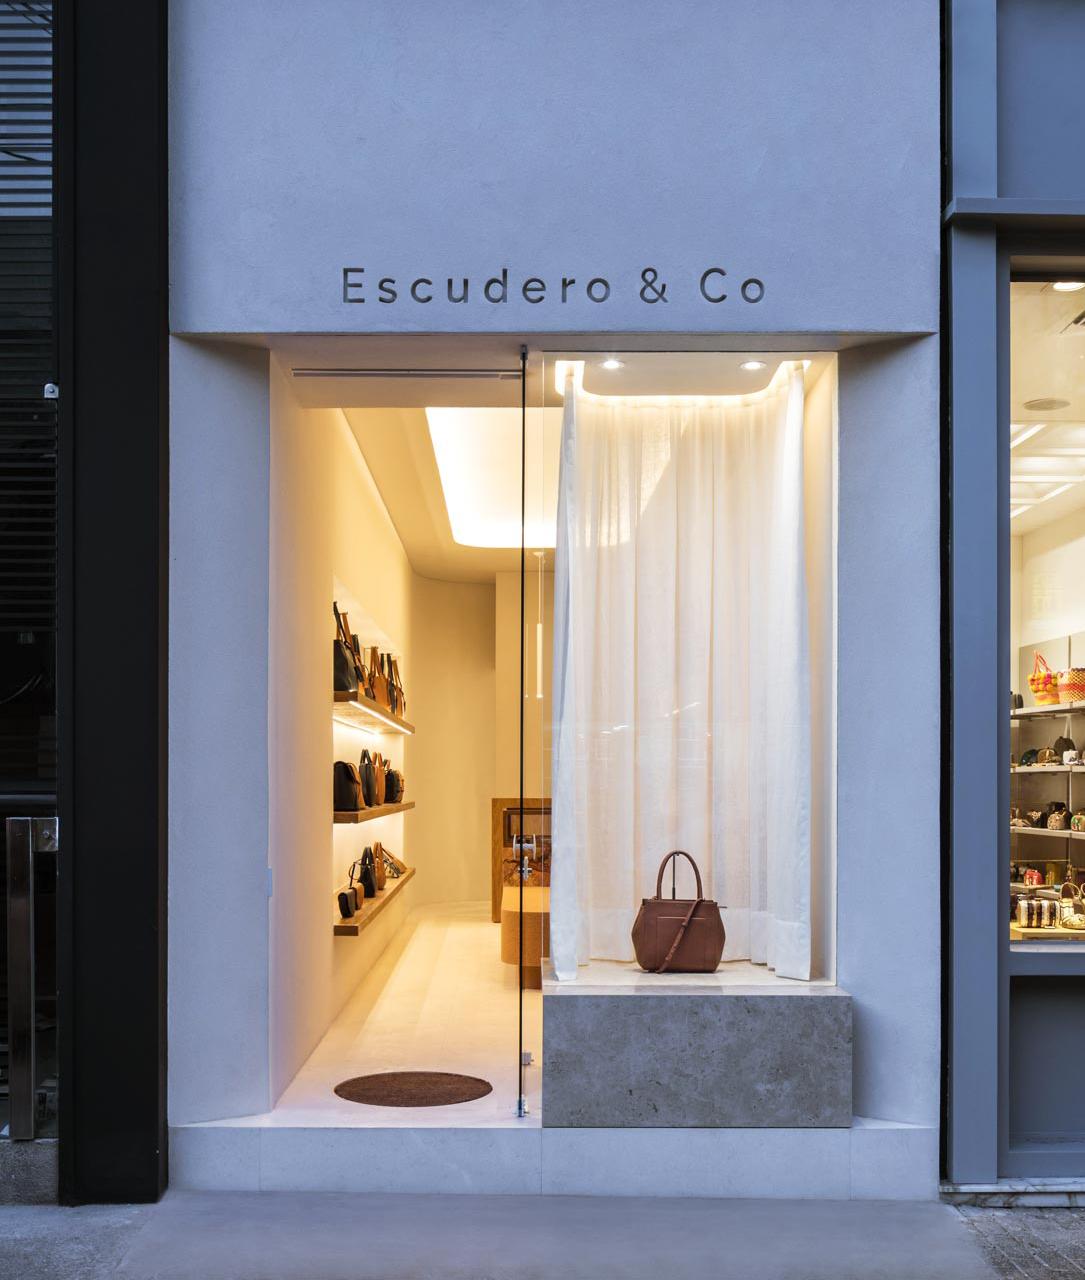 Loja da Escudero na alameda Lorena, em São Paulo / Cortesia